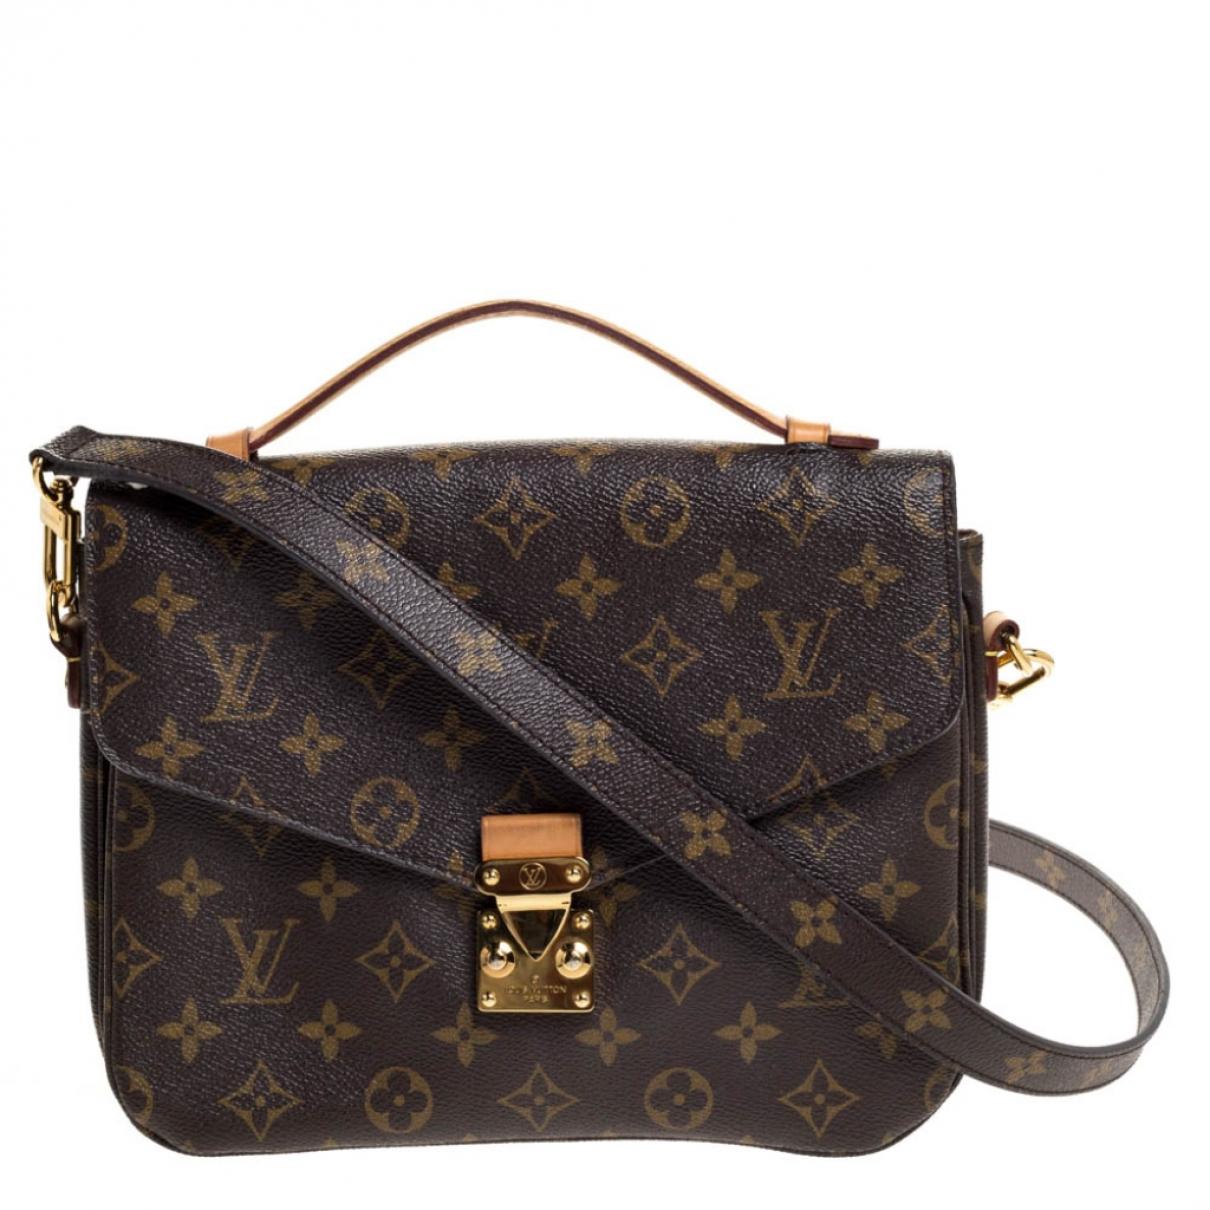 Louis Vuitton Metis Brown Cloth handbag for Women N